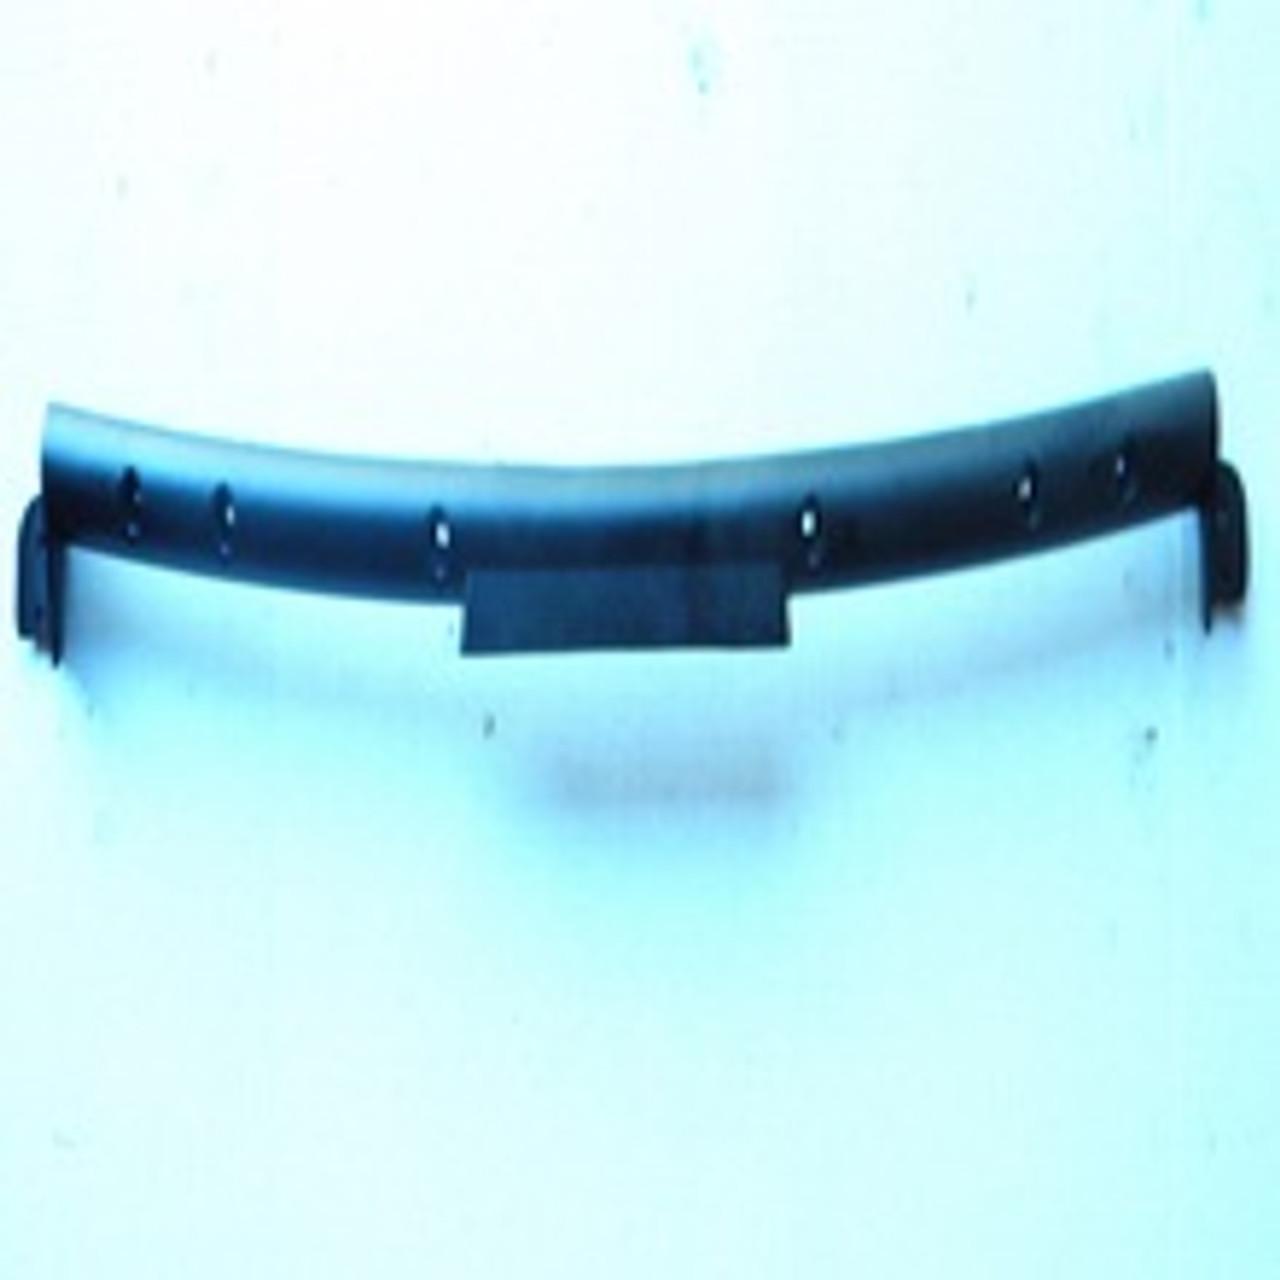 Sears Nordic Track Treadmill Model 249650 T 5.3 Pulse Bar Part 283678